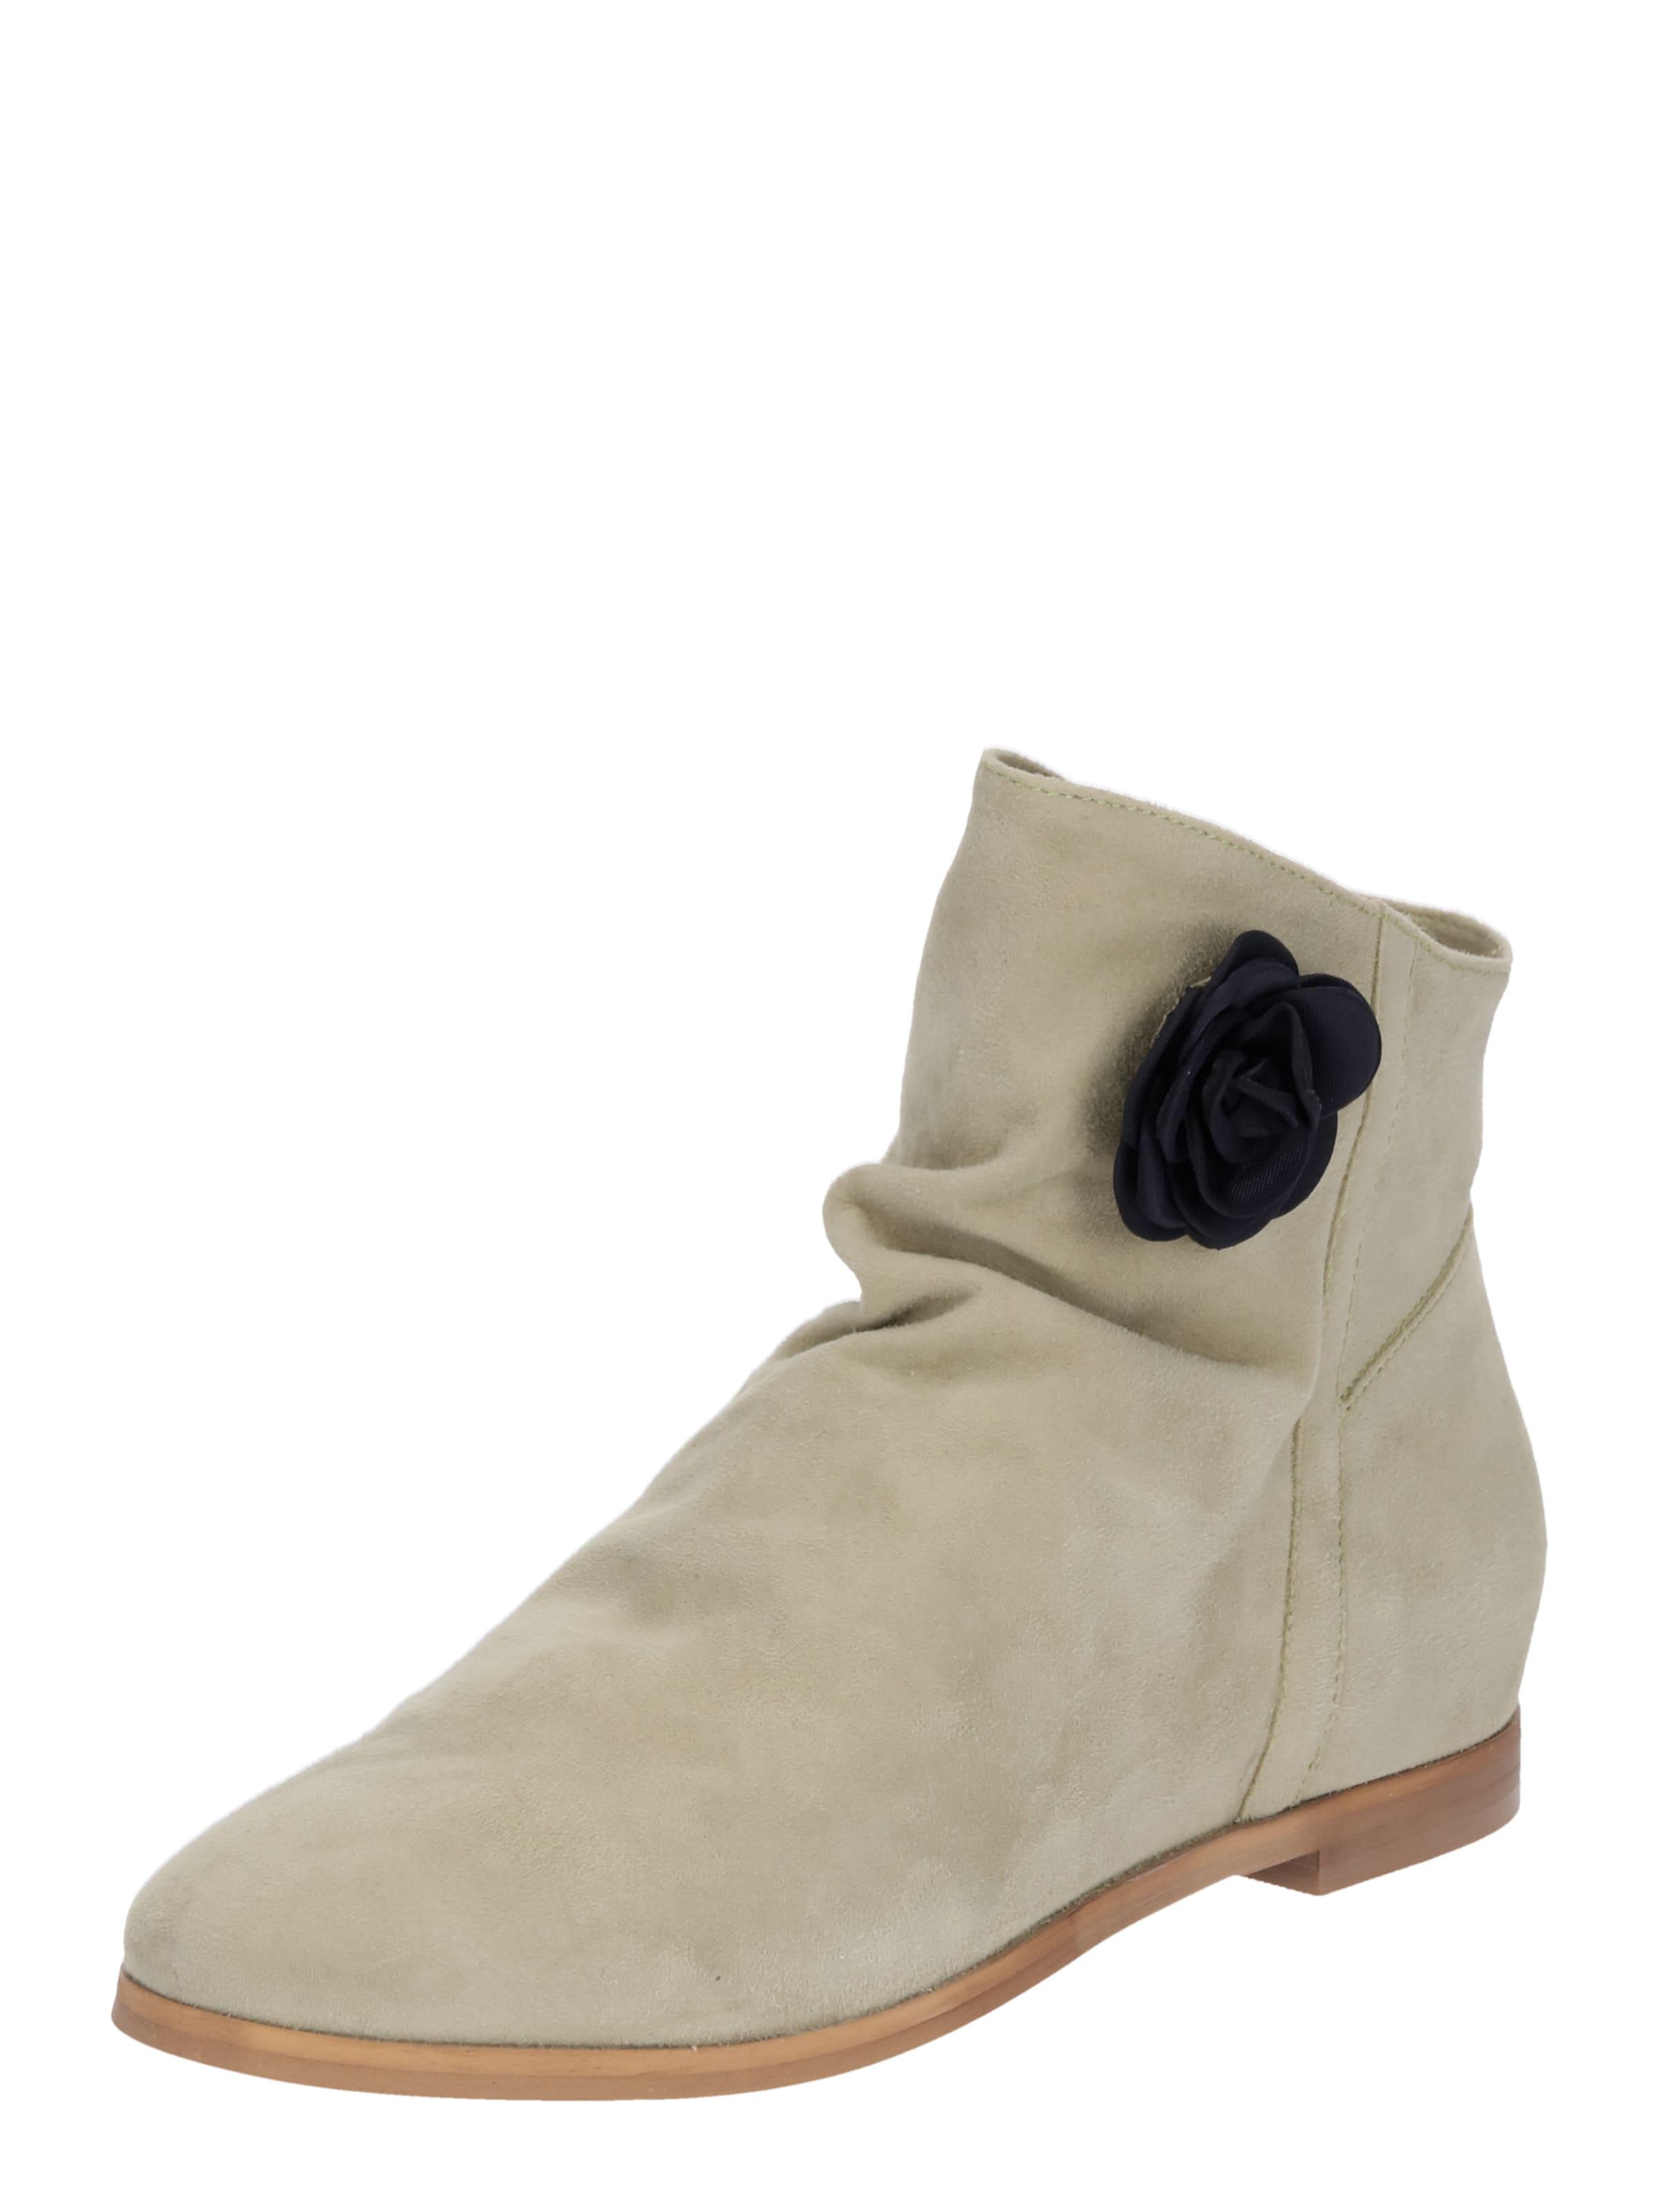 SPM Ankle Boots 'Yaylala' beige smHpYFHIId